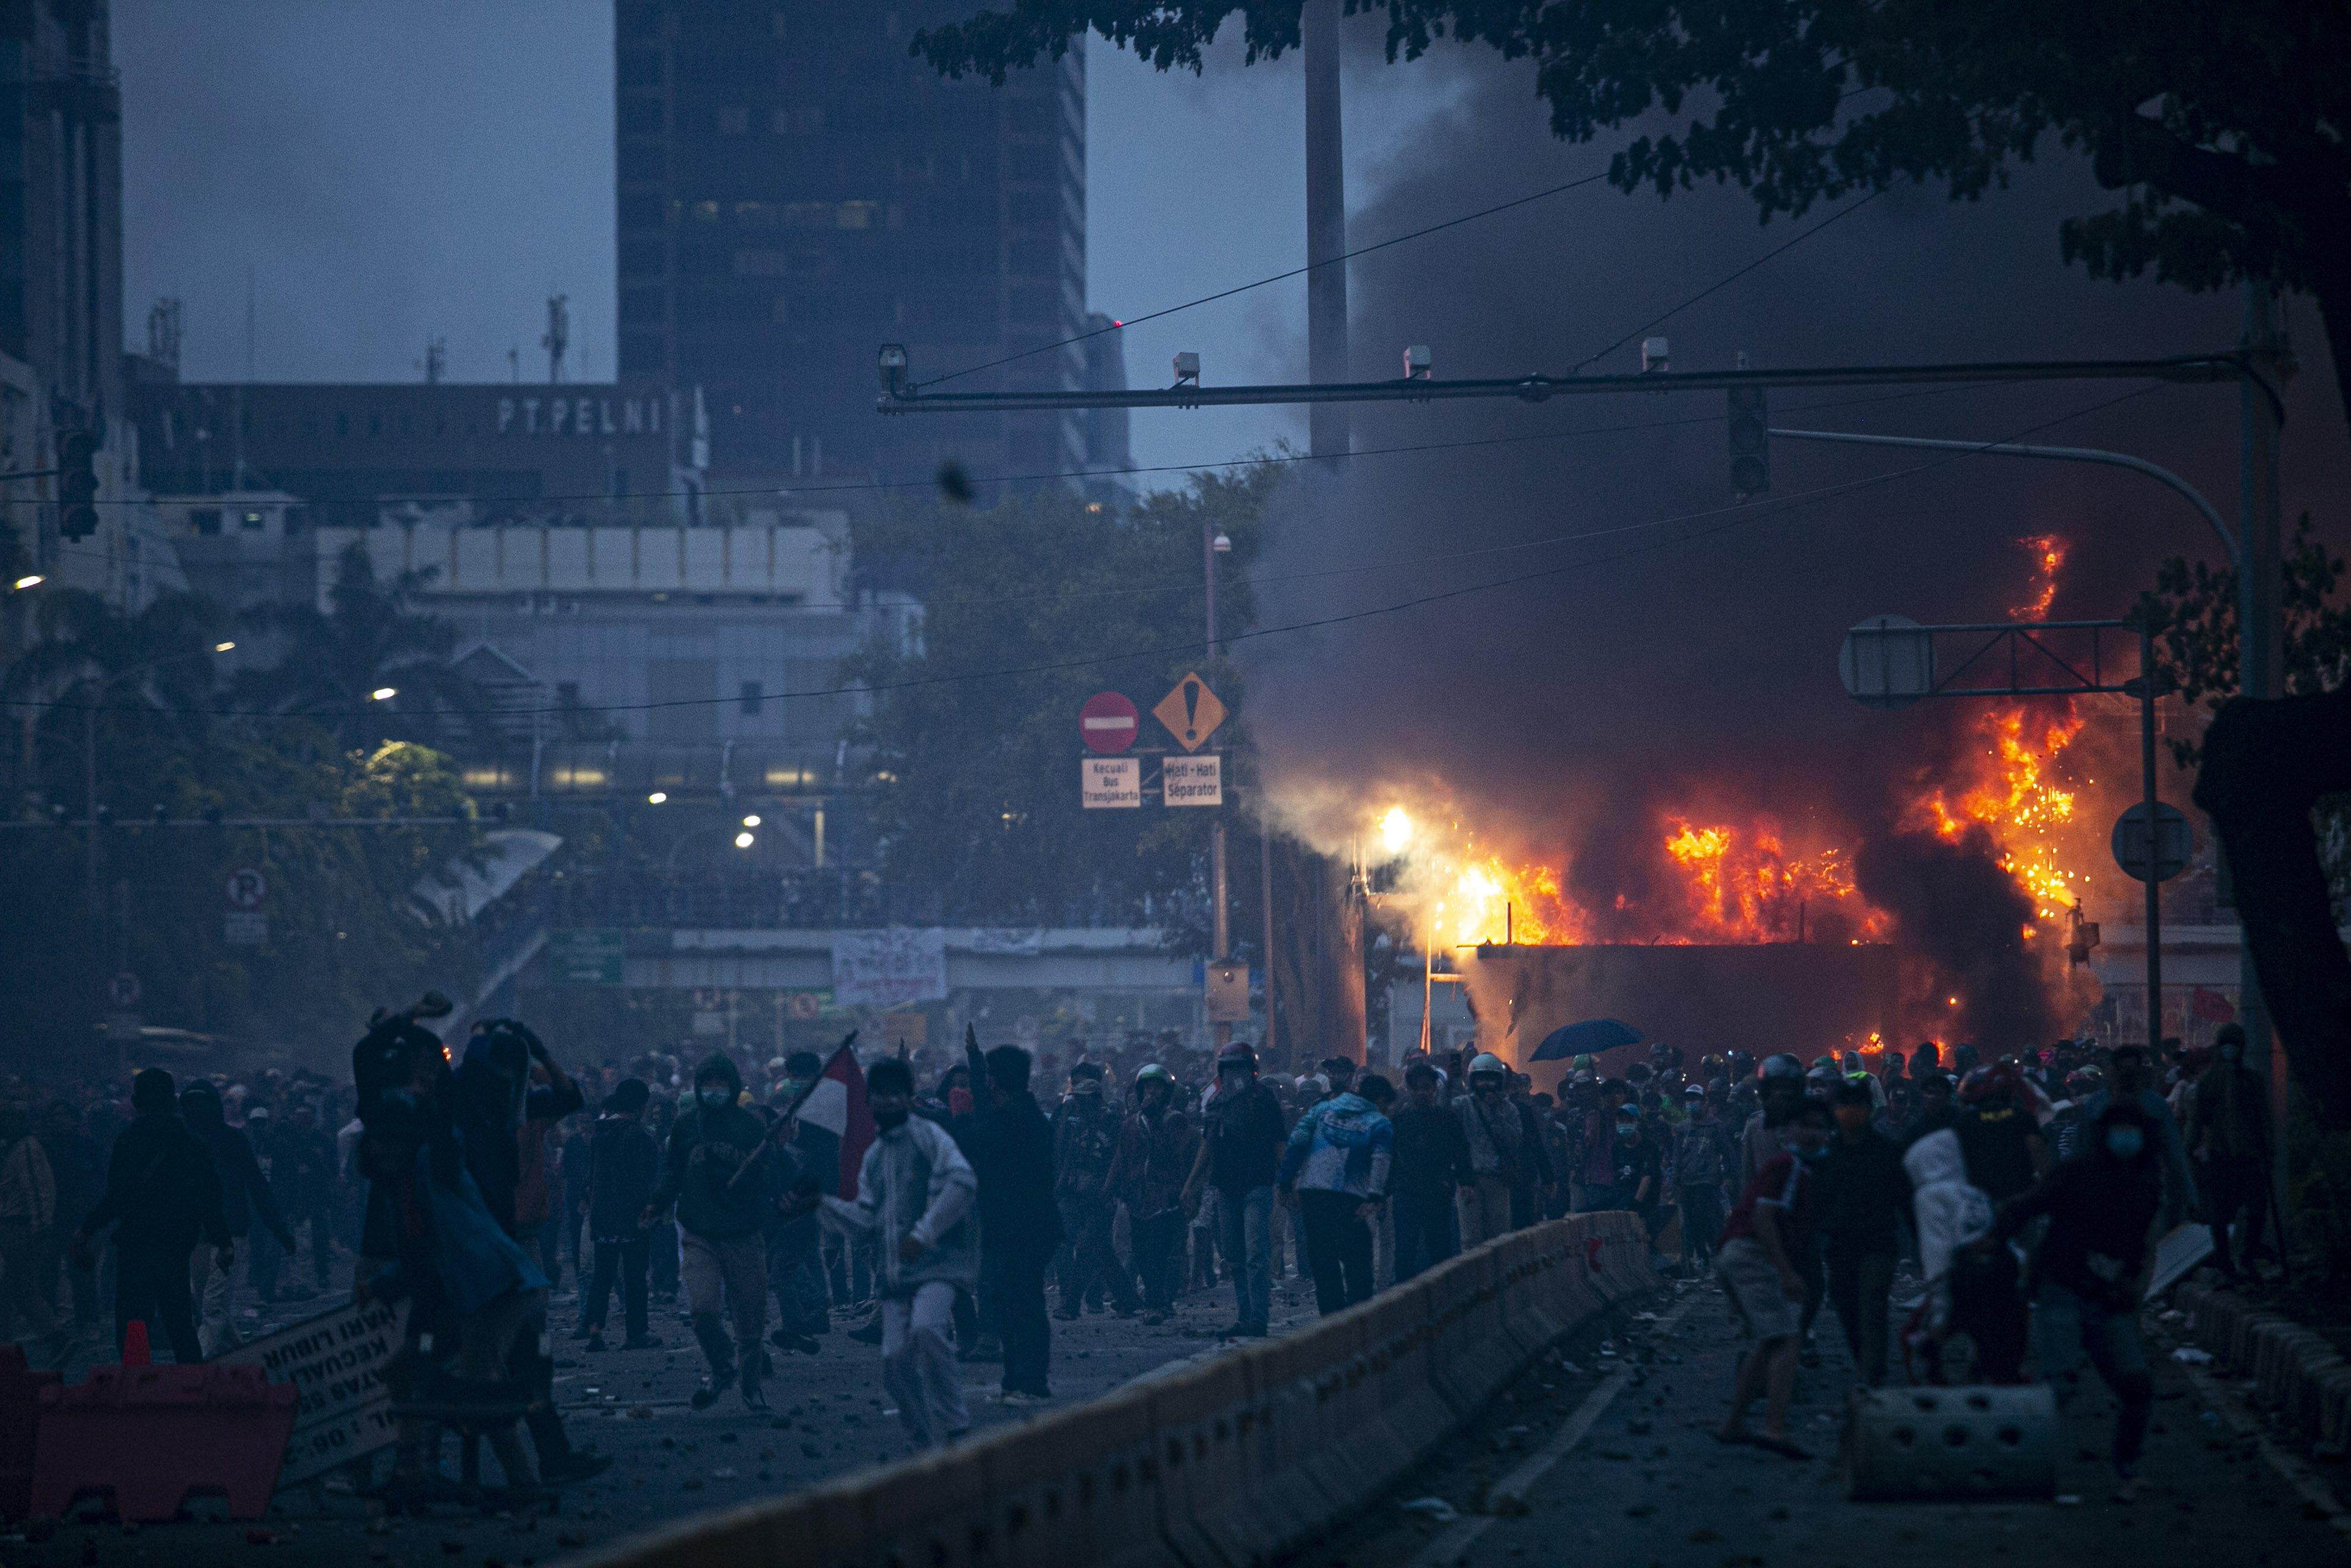 Suasana aksi tolak Omnibus Law di Kawasan Harmoni, Jakarta Pusat, Kamis (8/10/2020). Aksi tersebut berujung bentrok dengan aparat kepolisian.